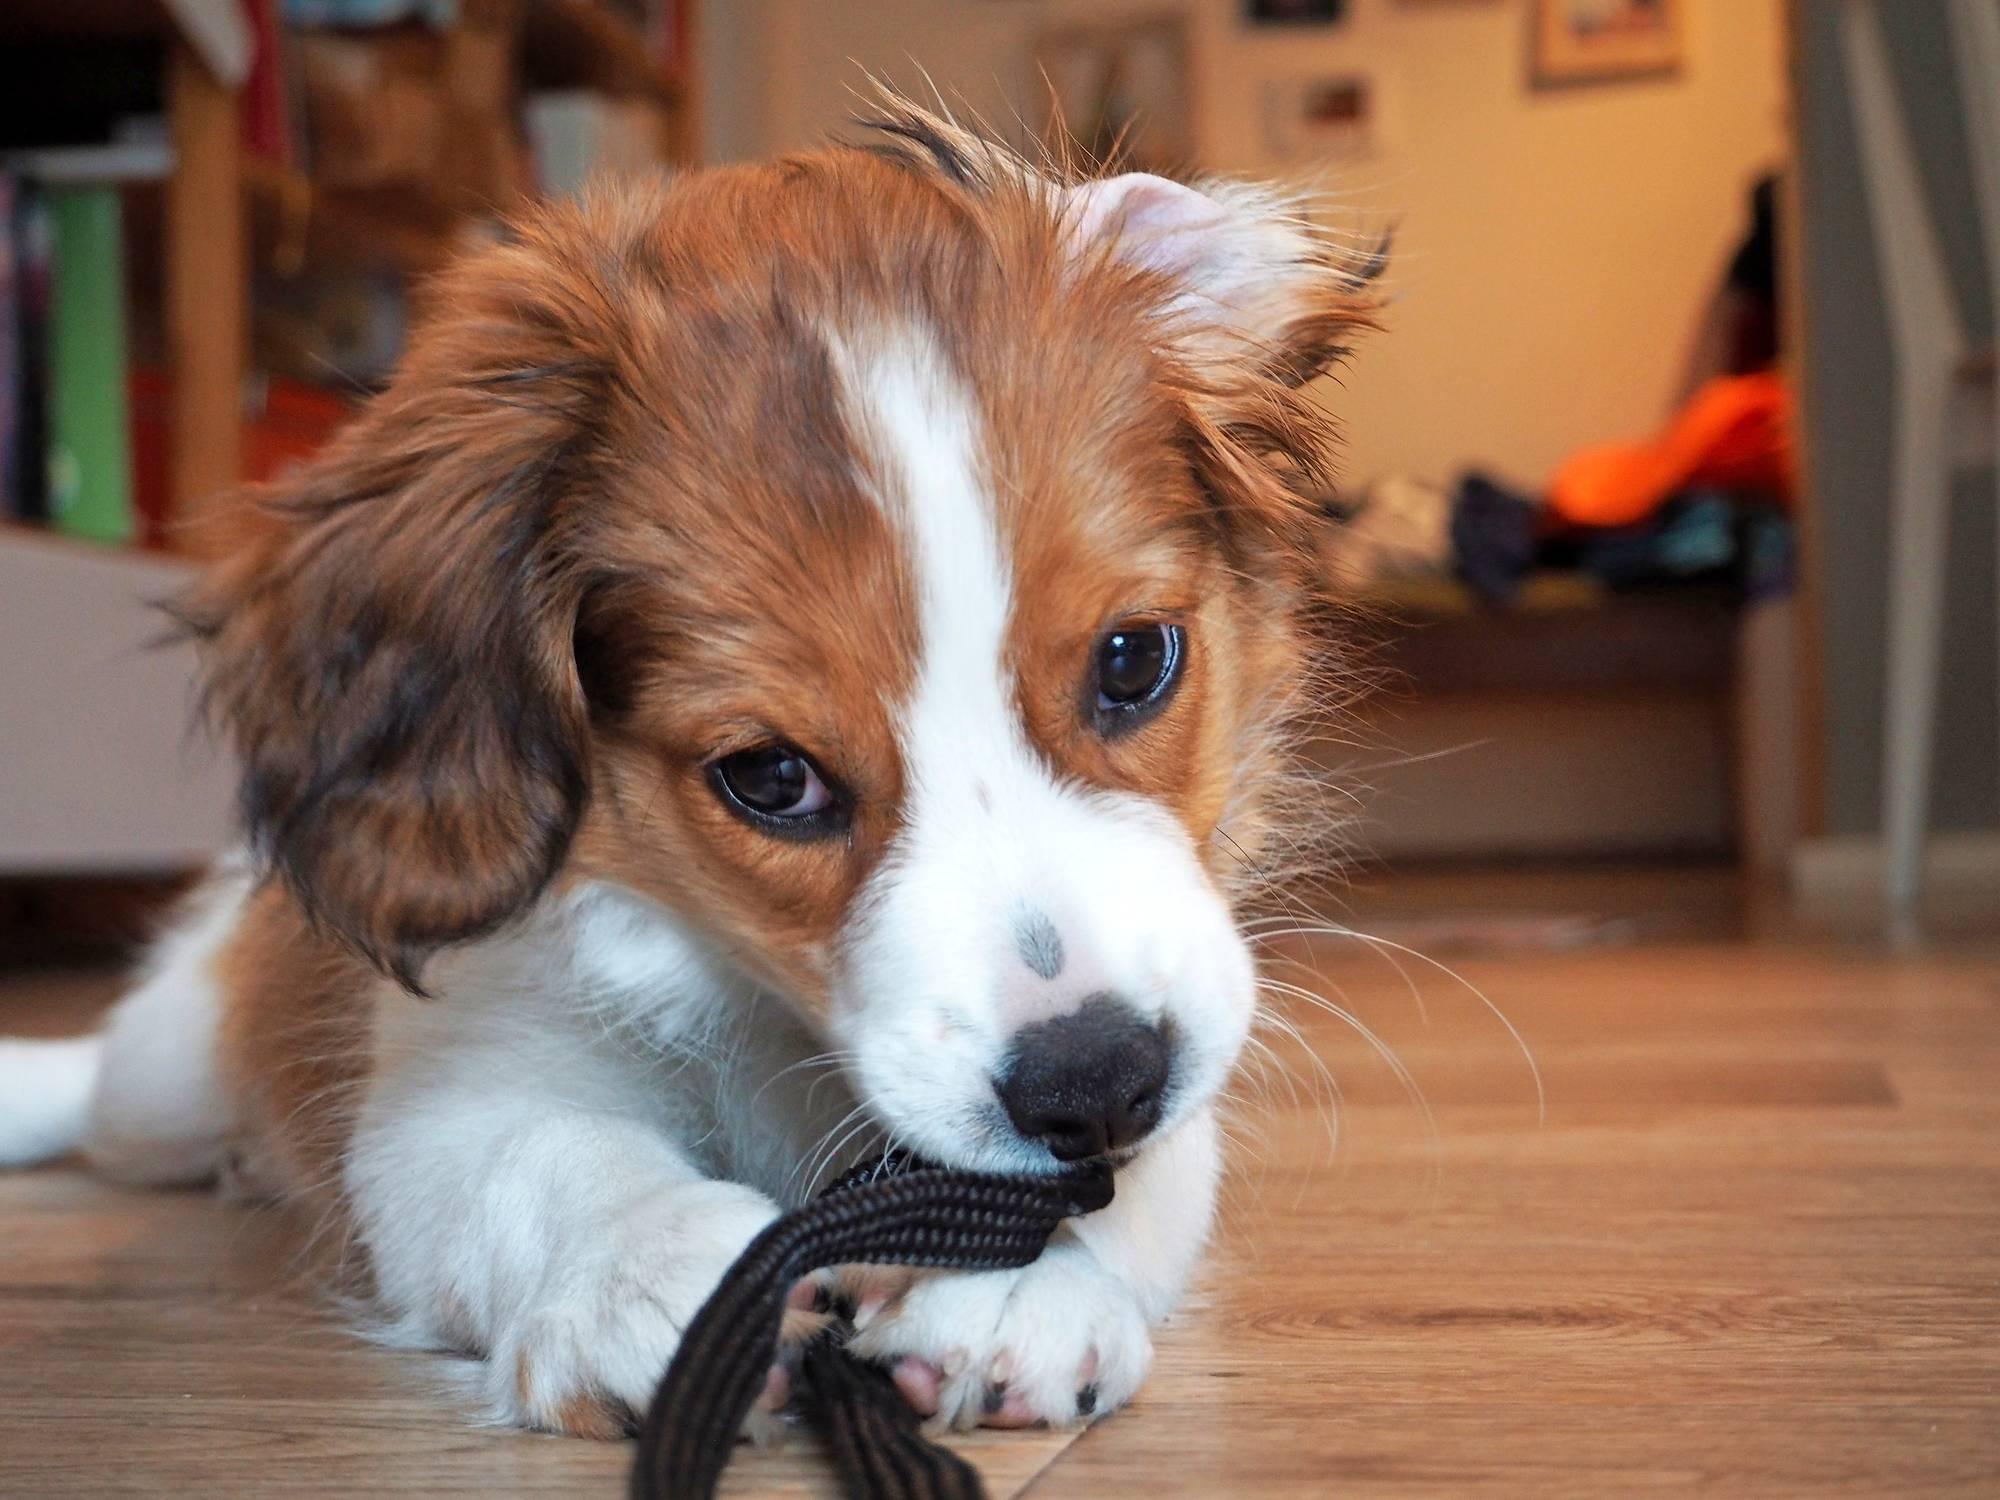 koiranpentu jyrsii narua